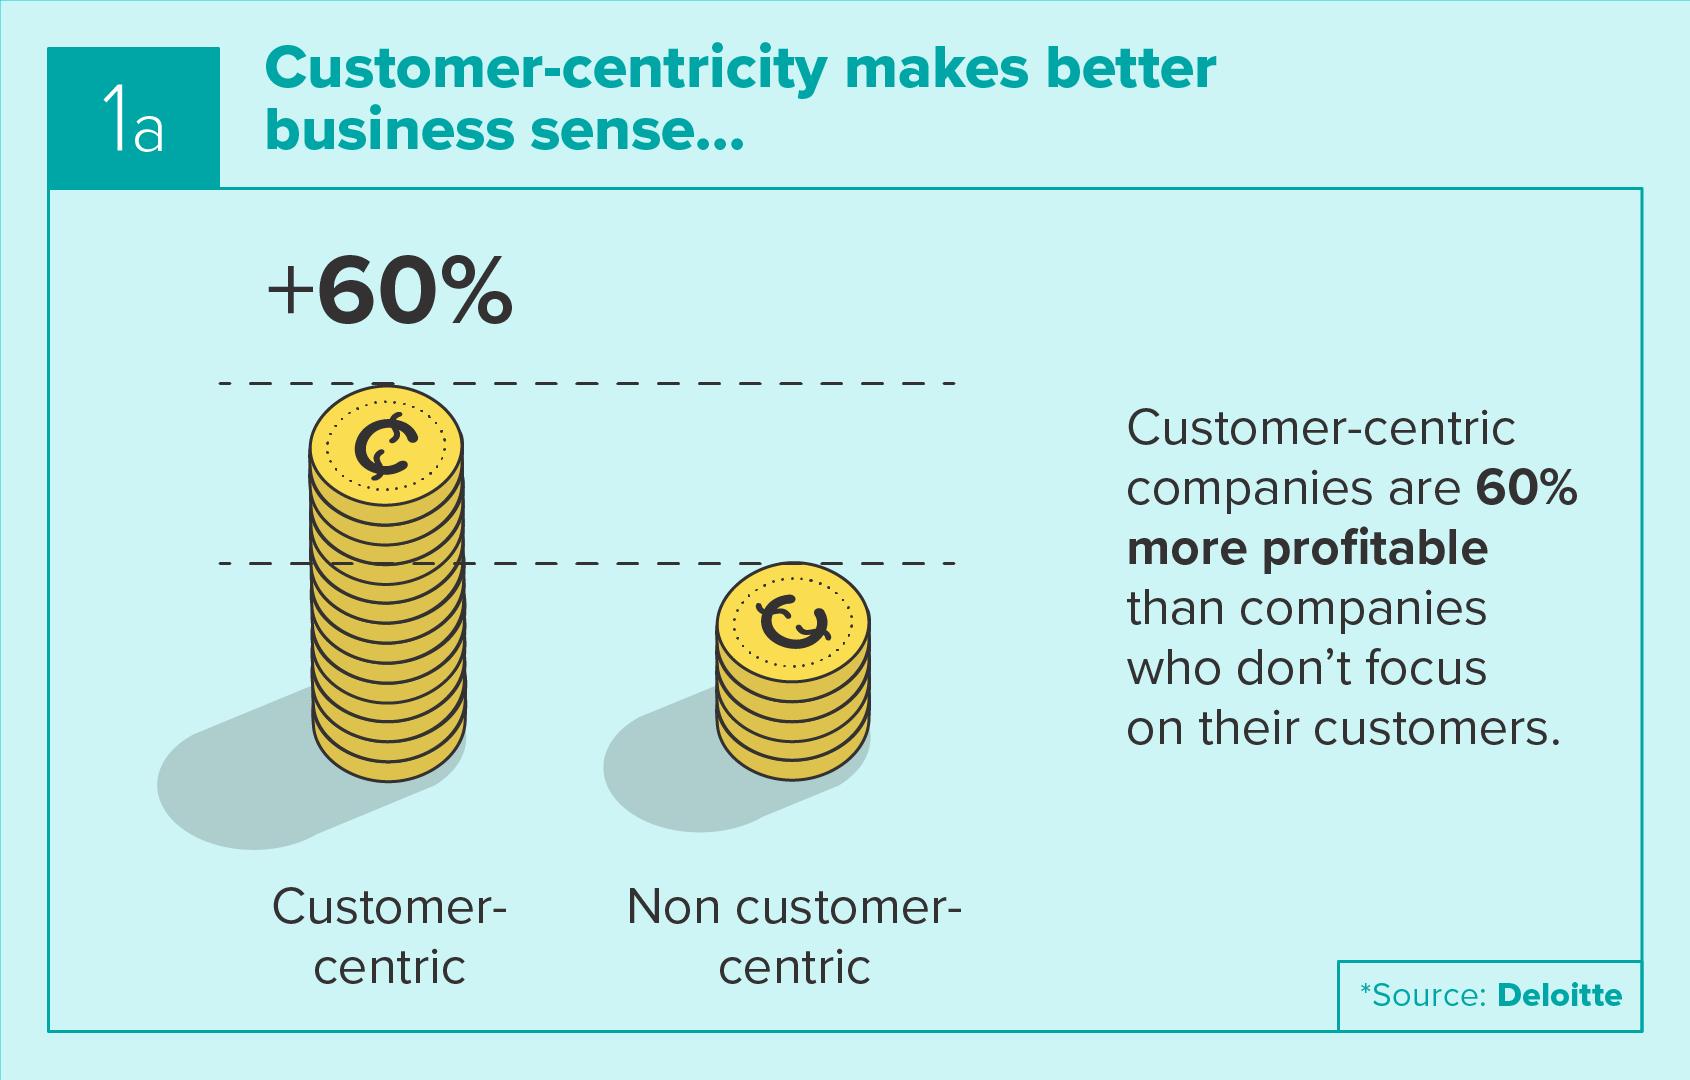 Customer-centricity makes better business sense